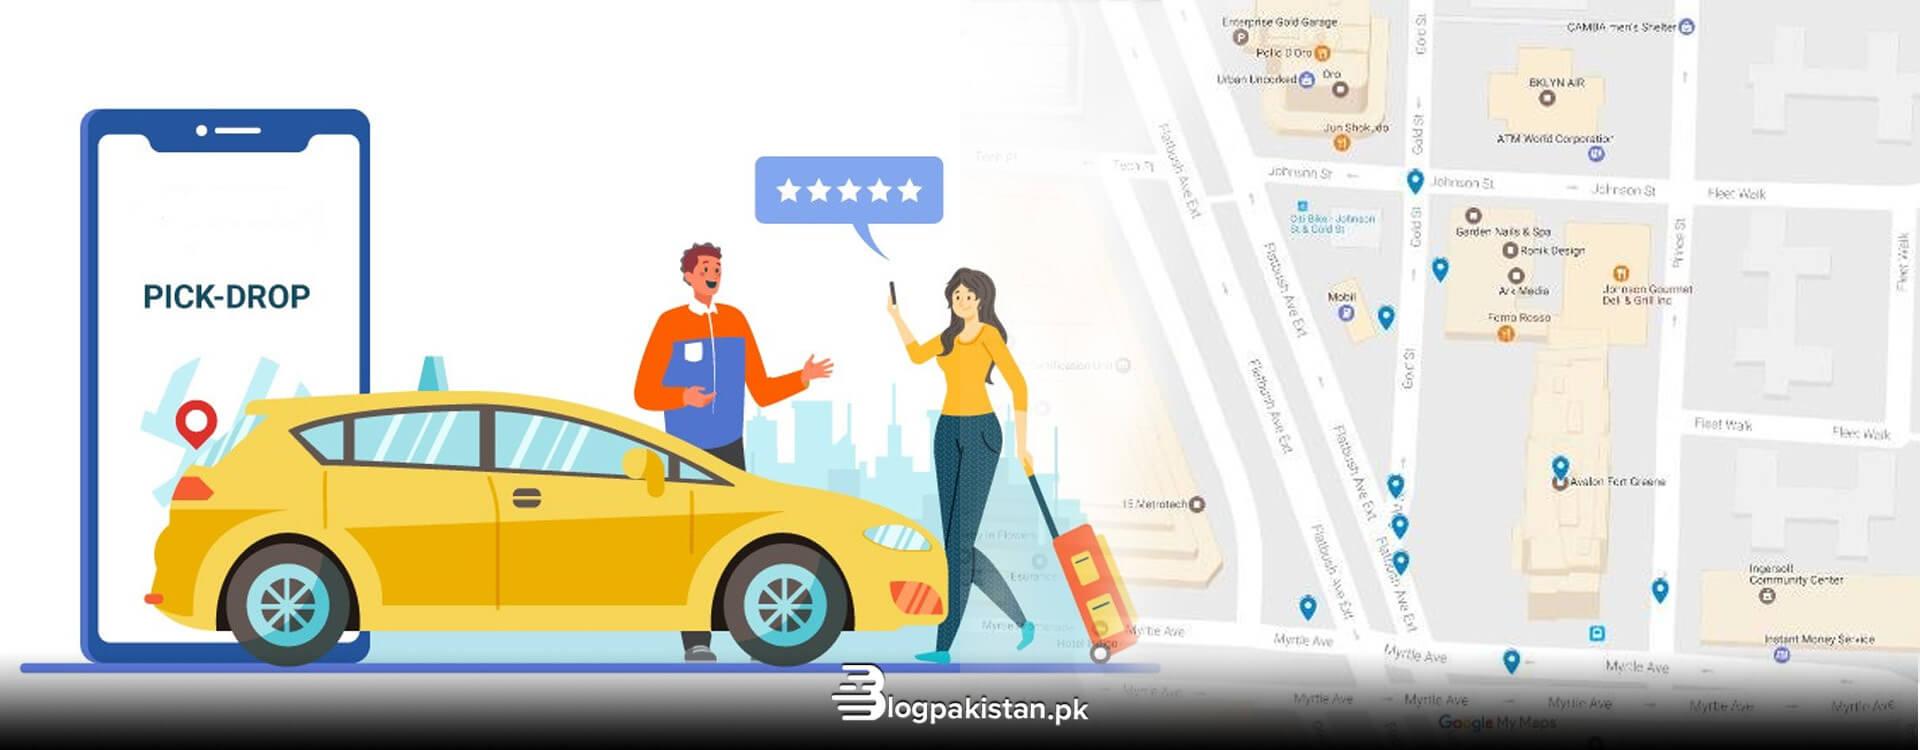 Pick & Drop service in Islamabad, pick & drop service in Rawalpindi.